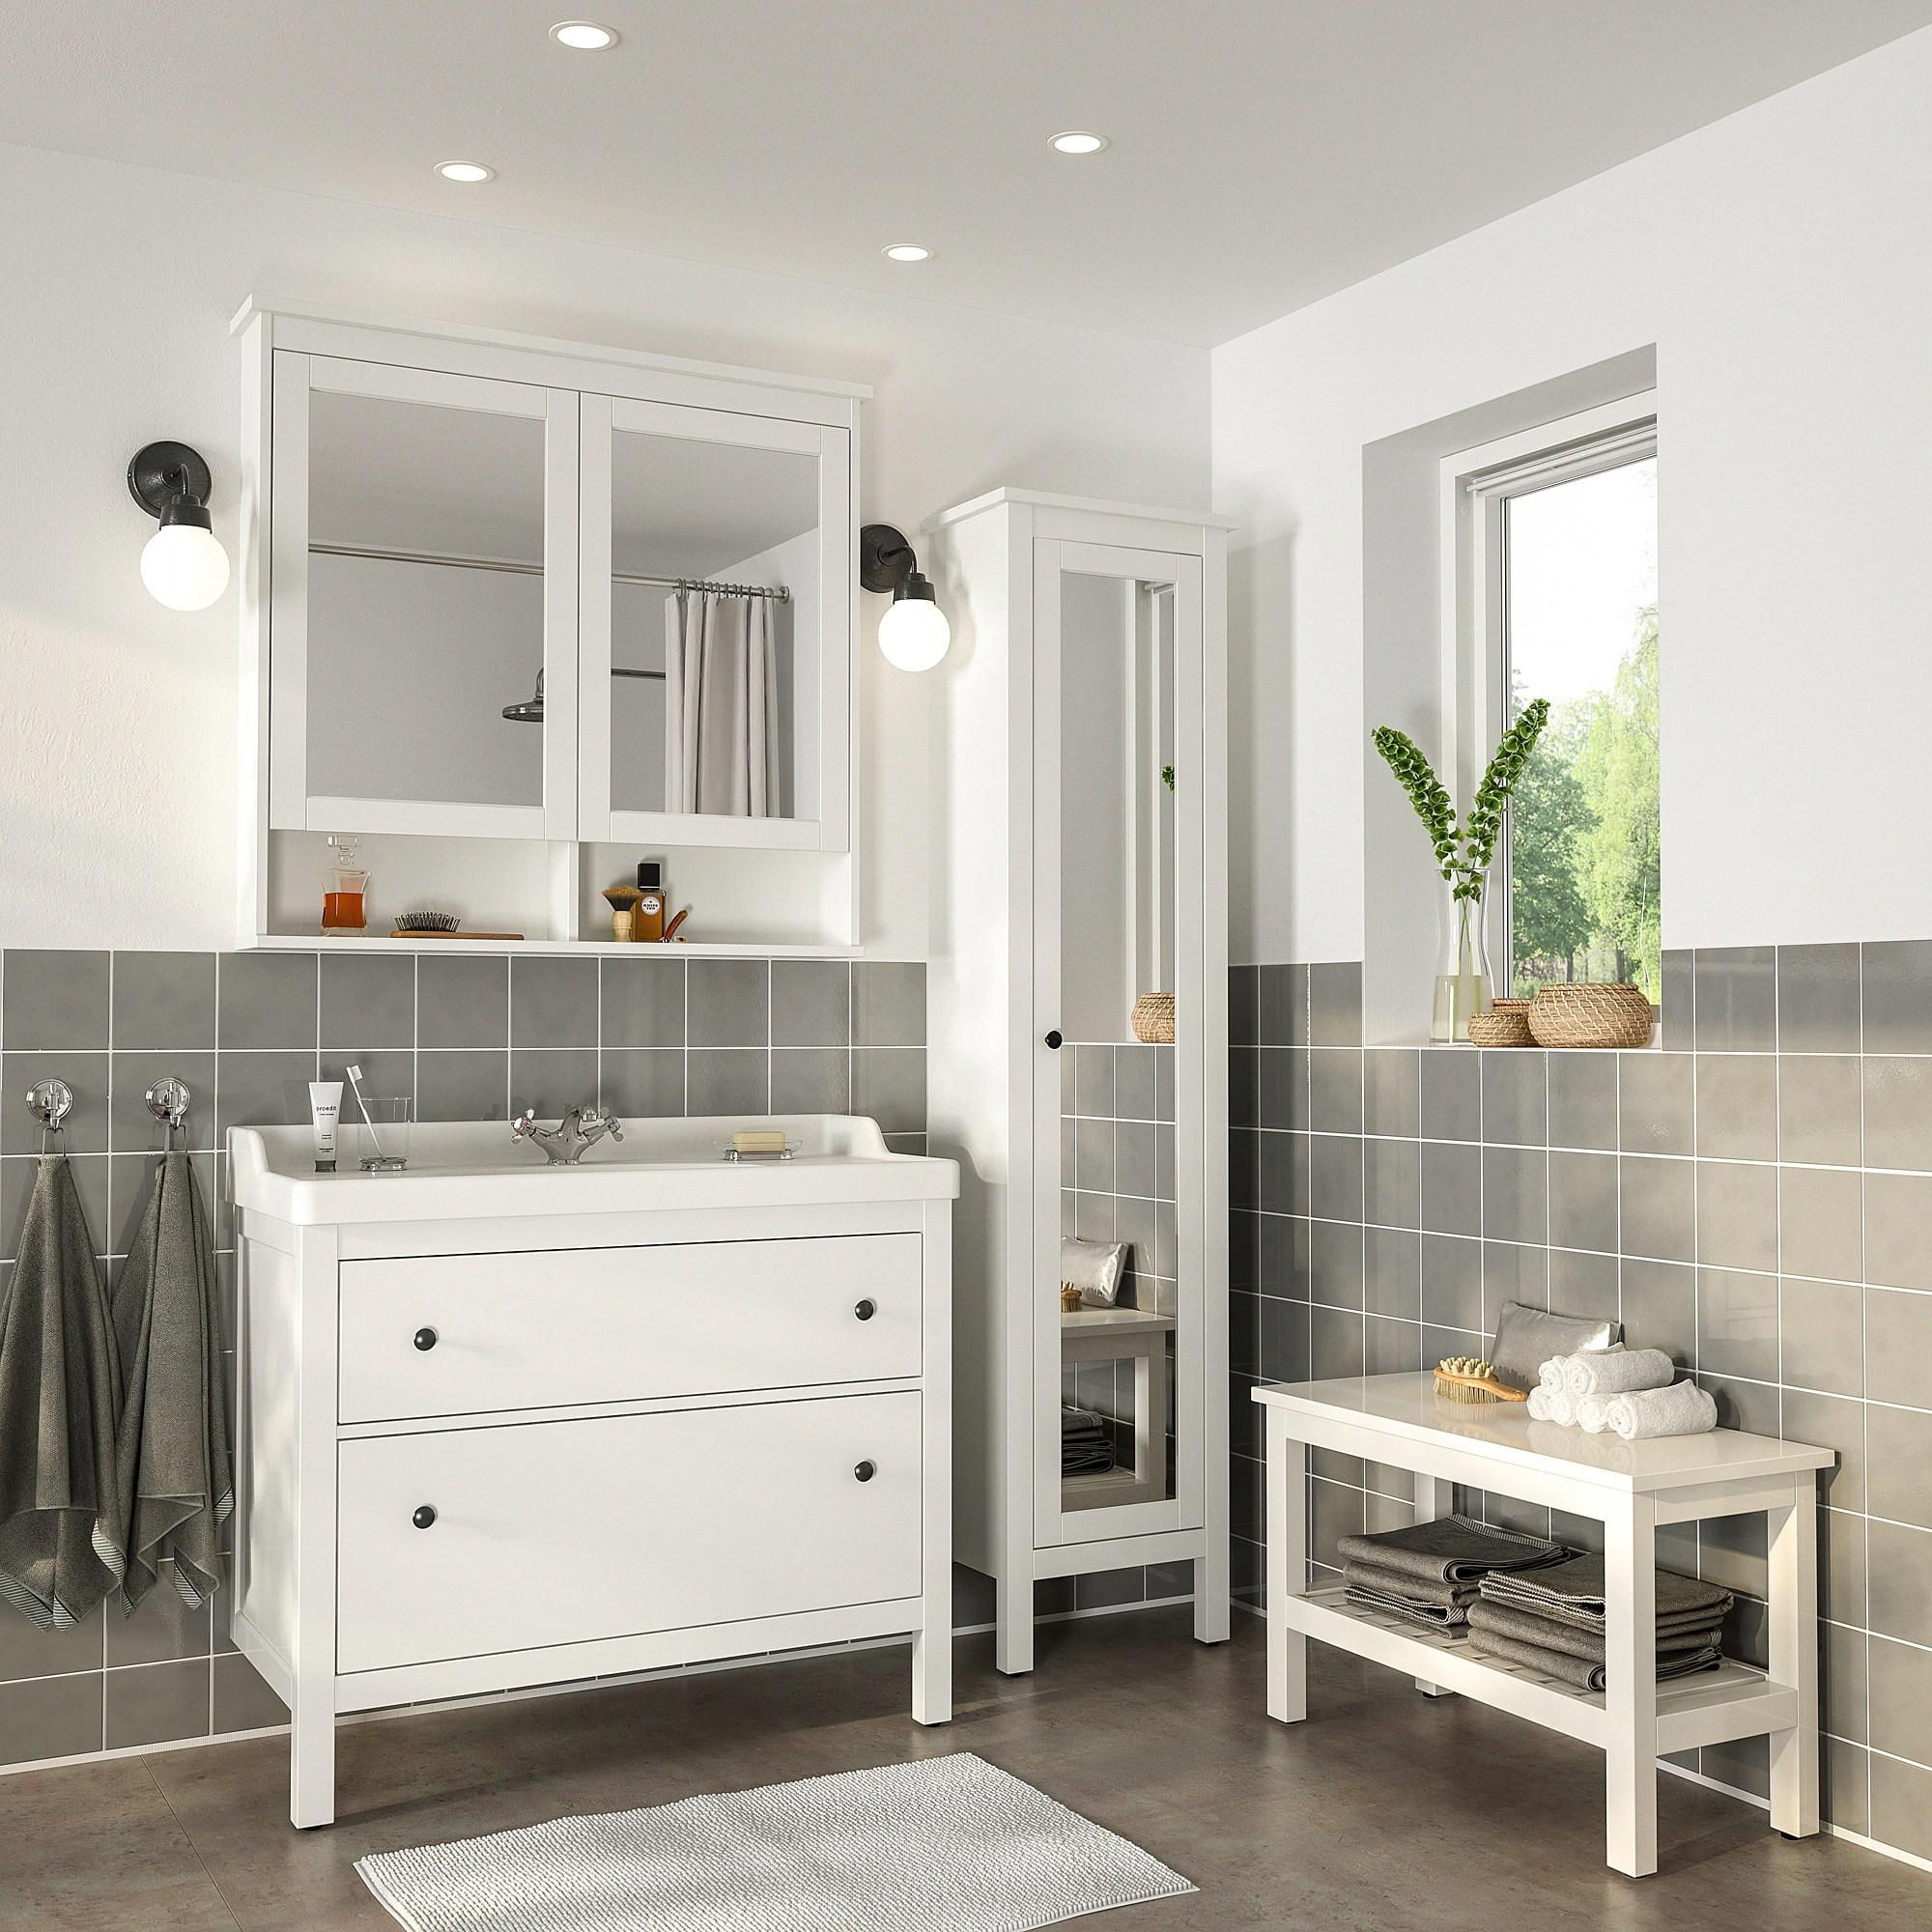 Hemnes Rattviken Mobilier Salle De Bain 5 Pieces Blanc Runskar Mitigeur Lavabo Ikea